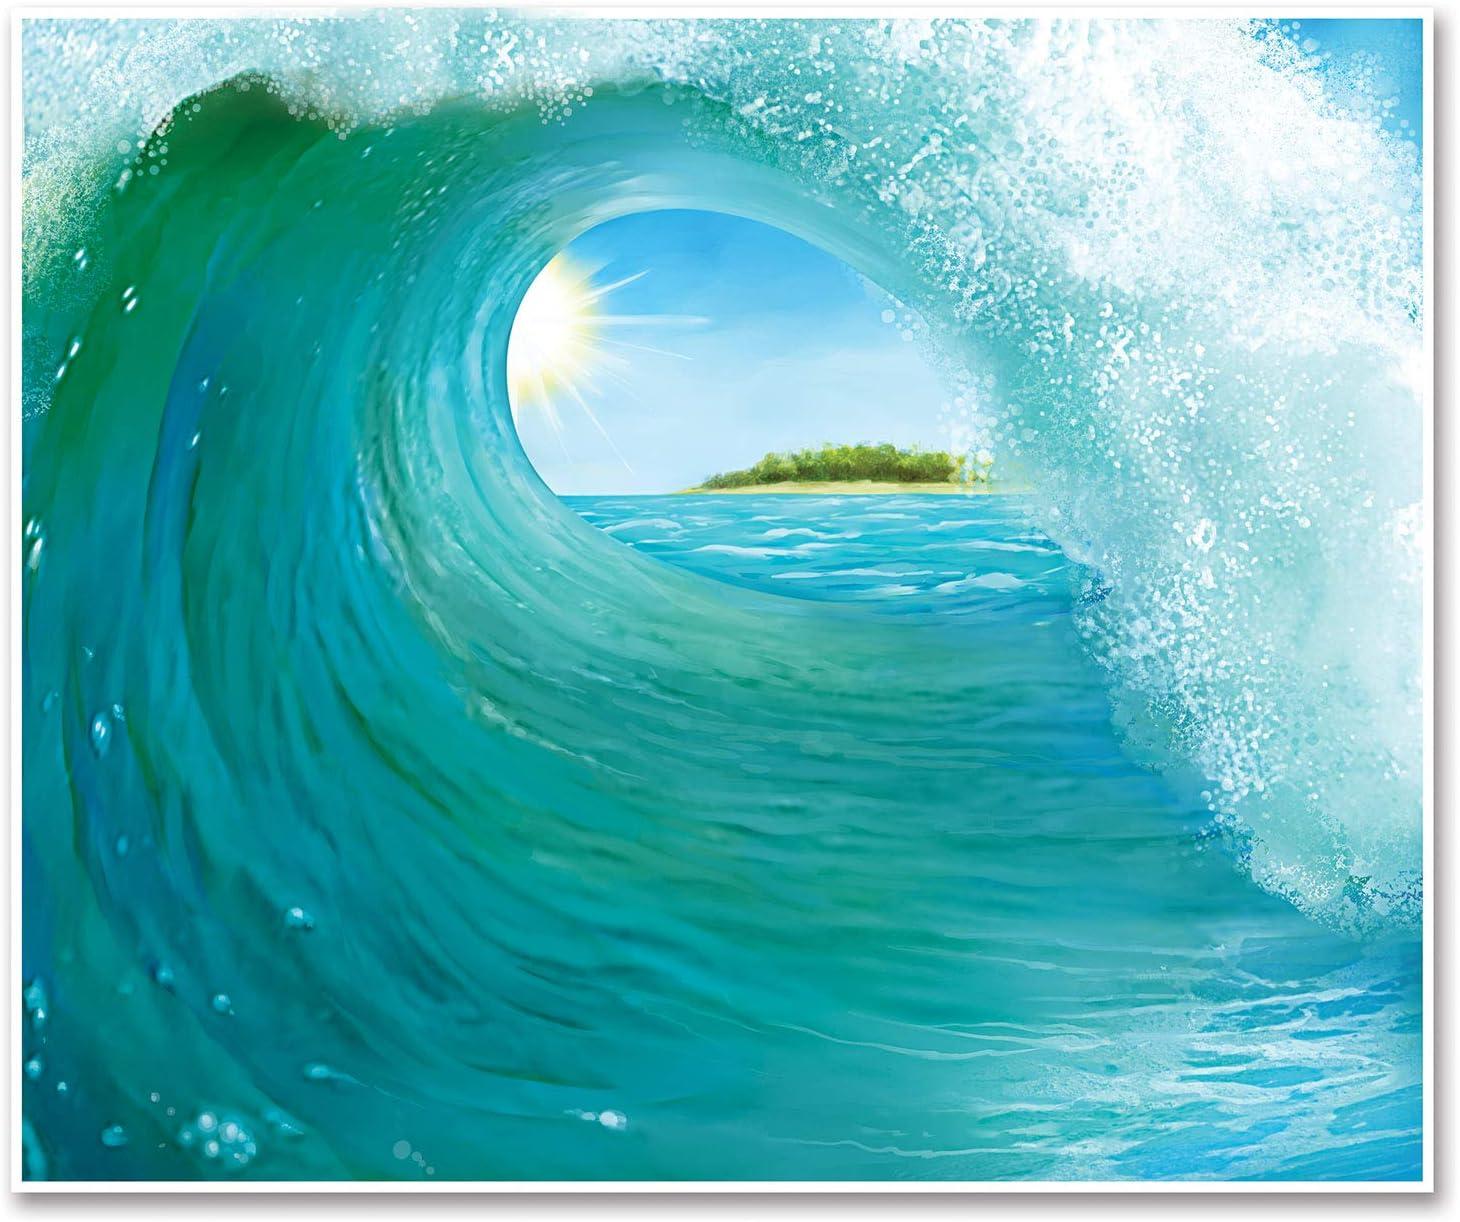 Hawaii Shield Bar Little Tavern Wall Border 100 cm x 25 Surf Board South Sea